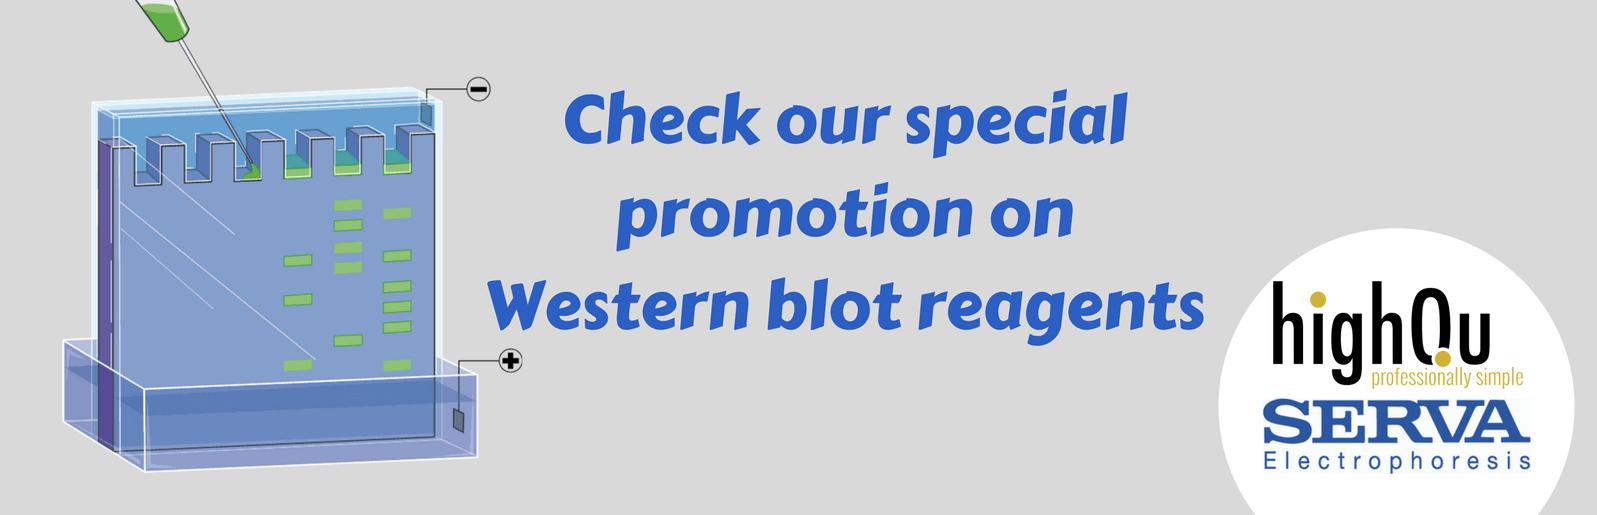 SERVA, oferta, western blot, electroforesis, transferencia, proteína, anticuerpo